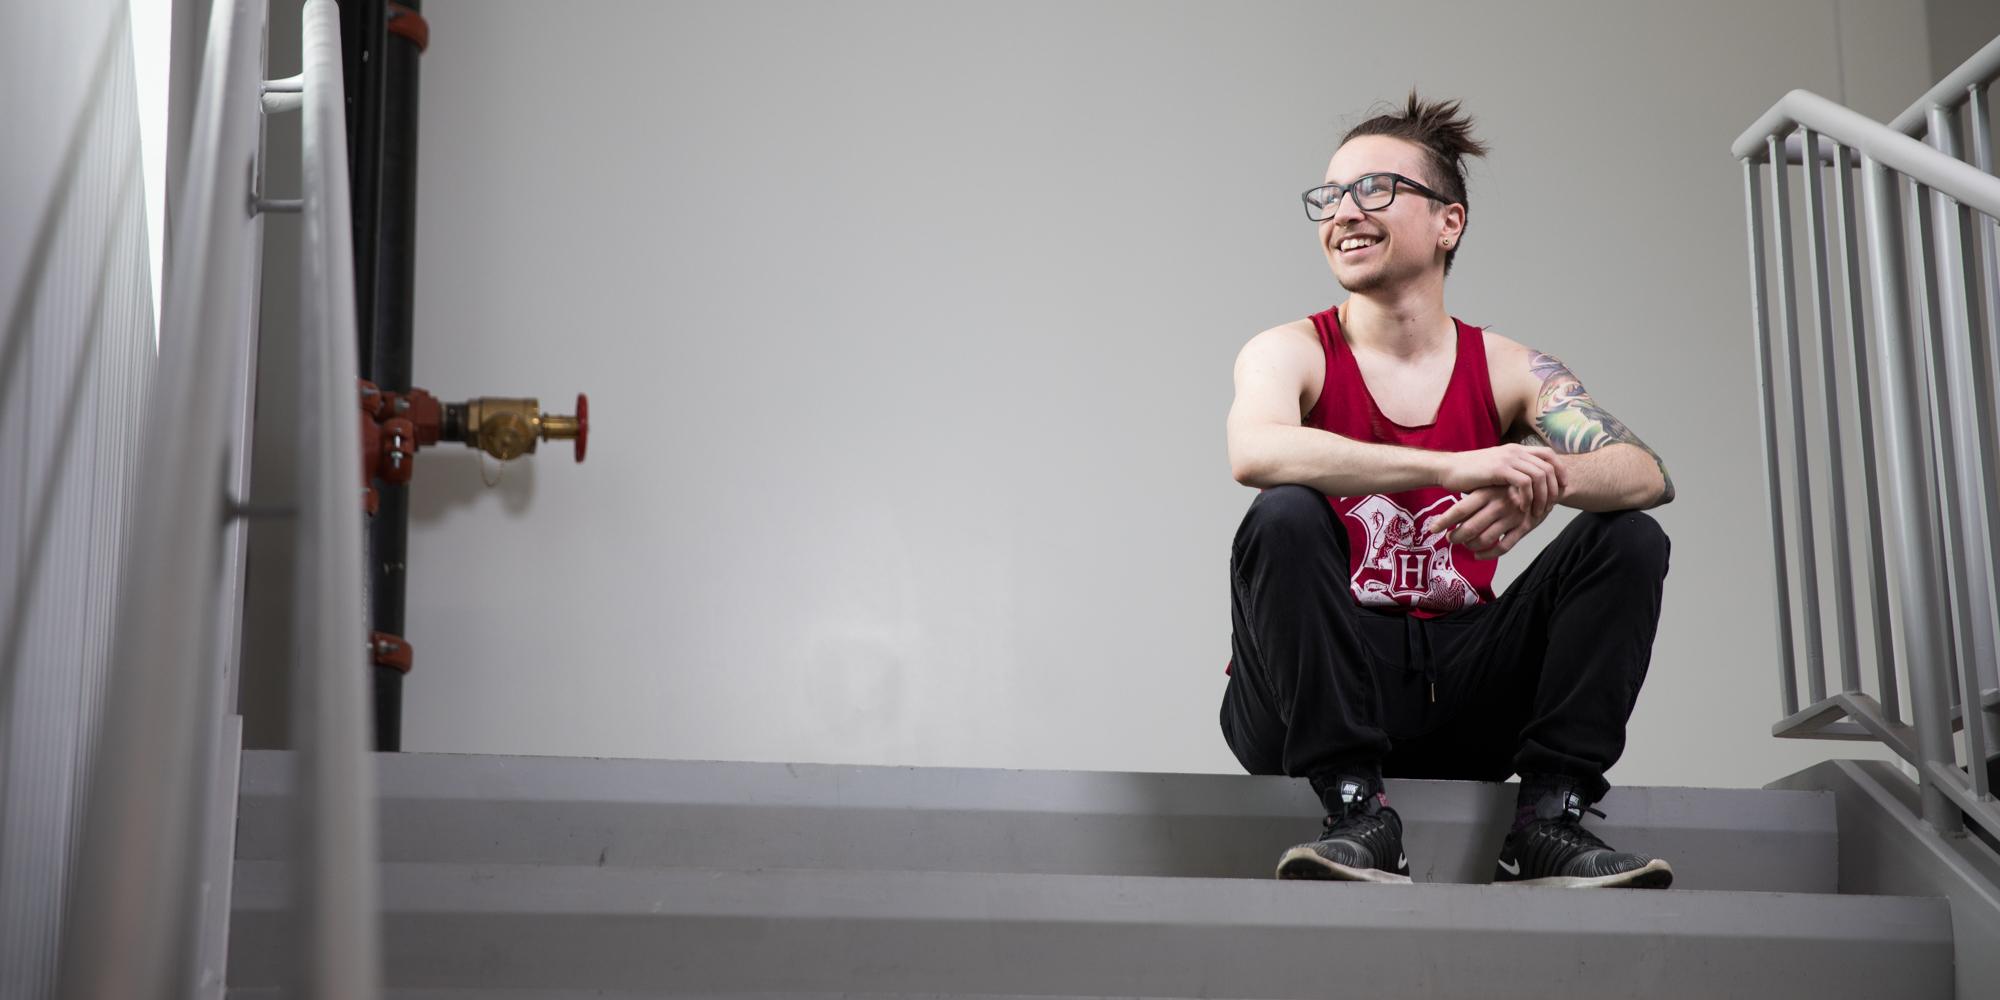 Fitness Program Raises The Bar For Lgbtq Inclusion